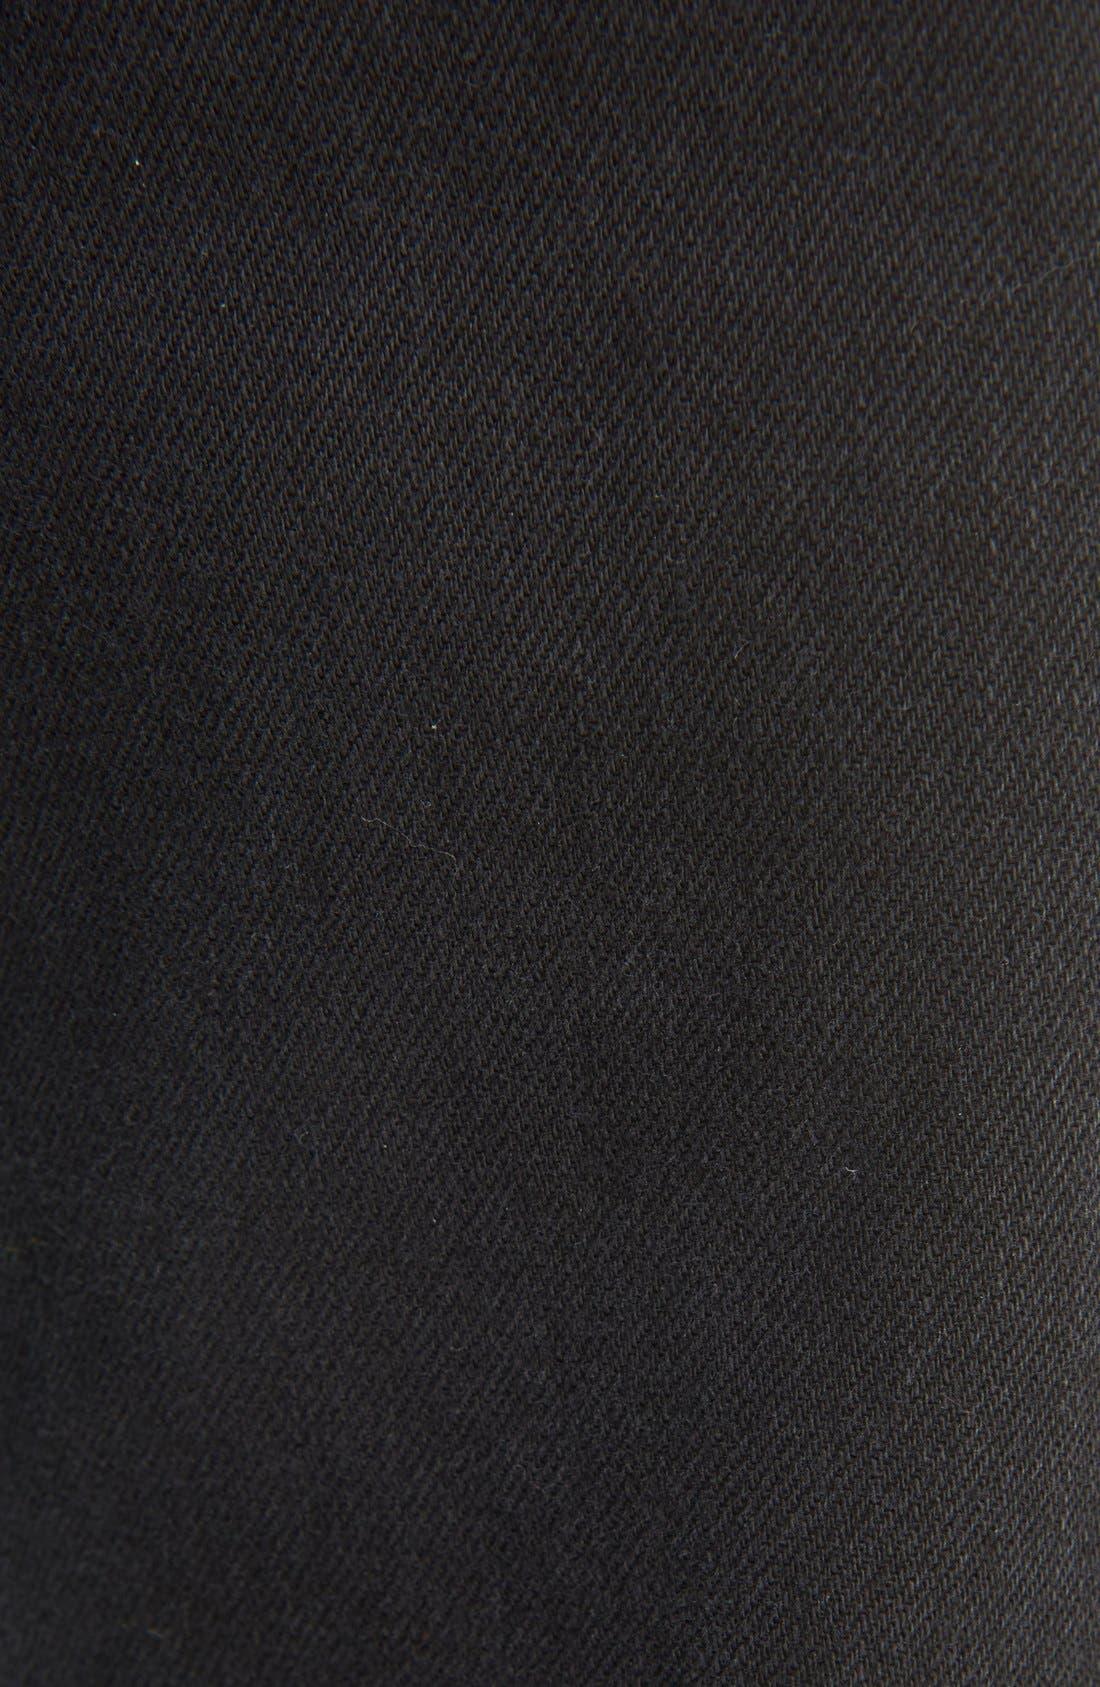 Boy Jeans,                             Alternate thumbnail 3, color,                             Black